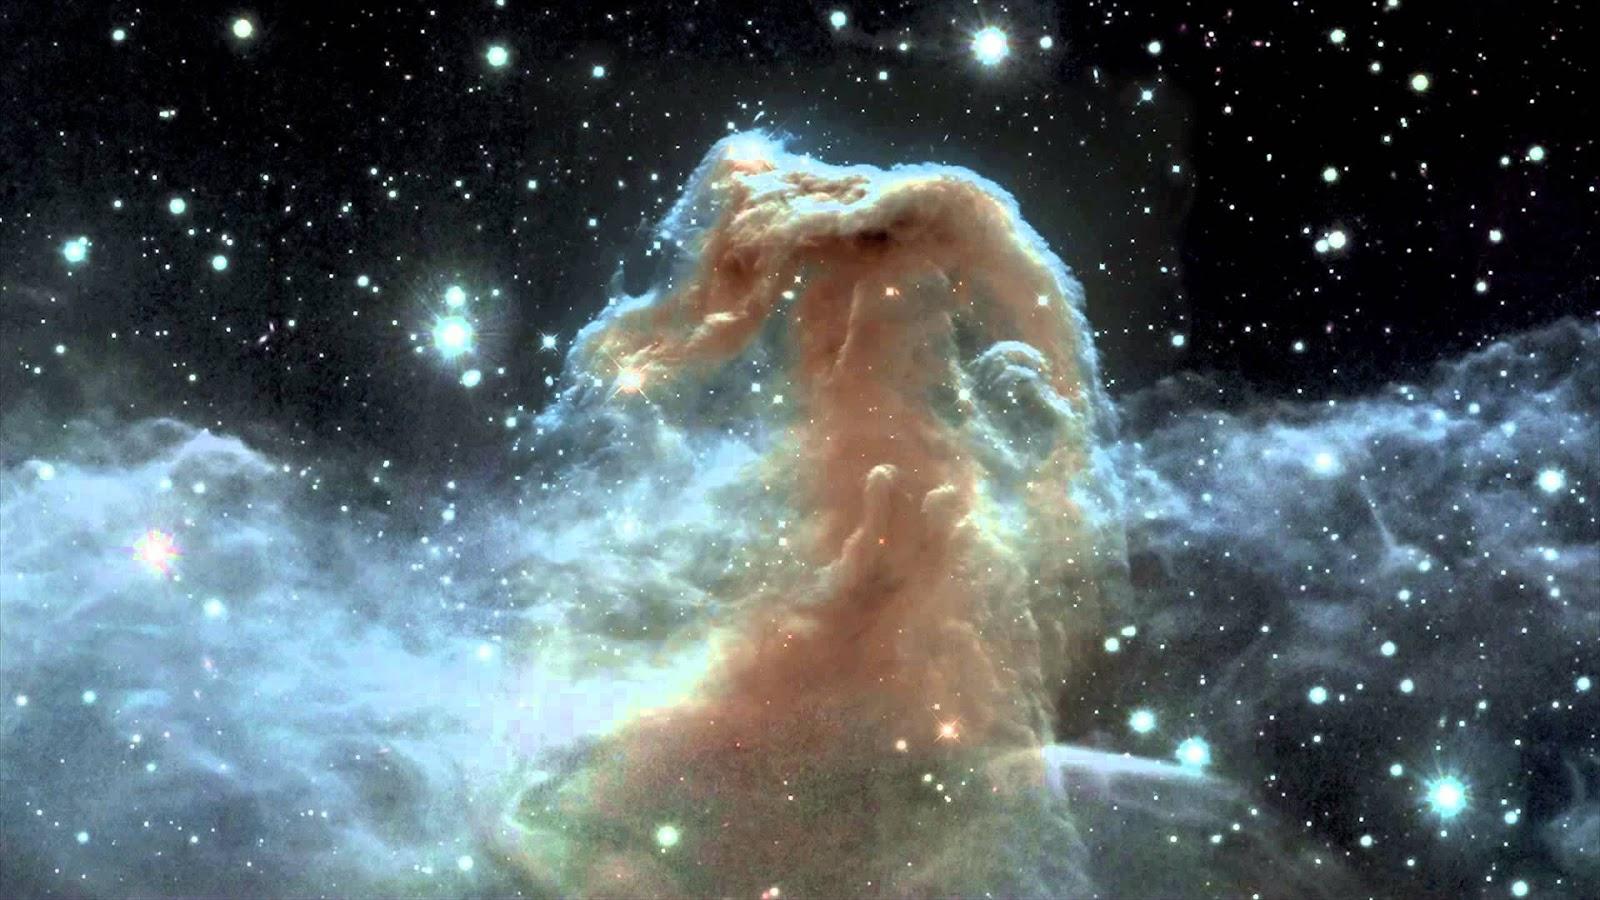 Good   Wallpaper Horse Nebula - Horsehead-Nebula-Wallpaper-HD-26  You Should Have_152118.jpg